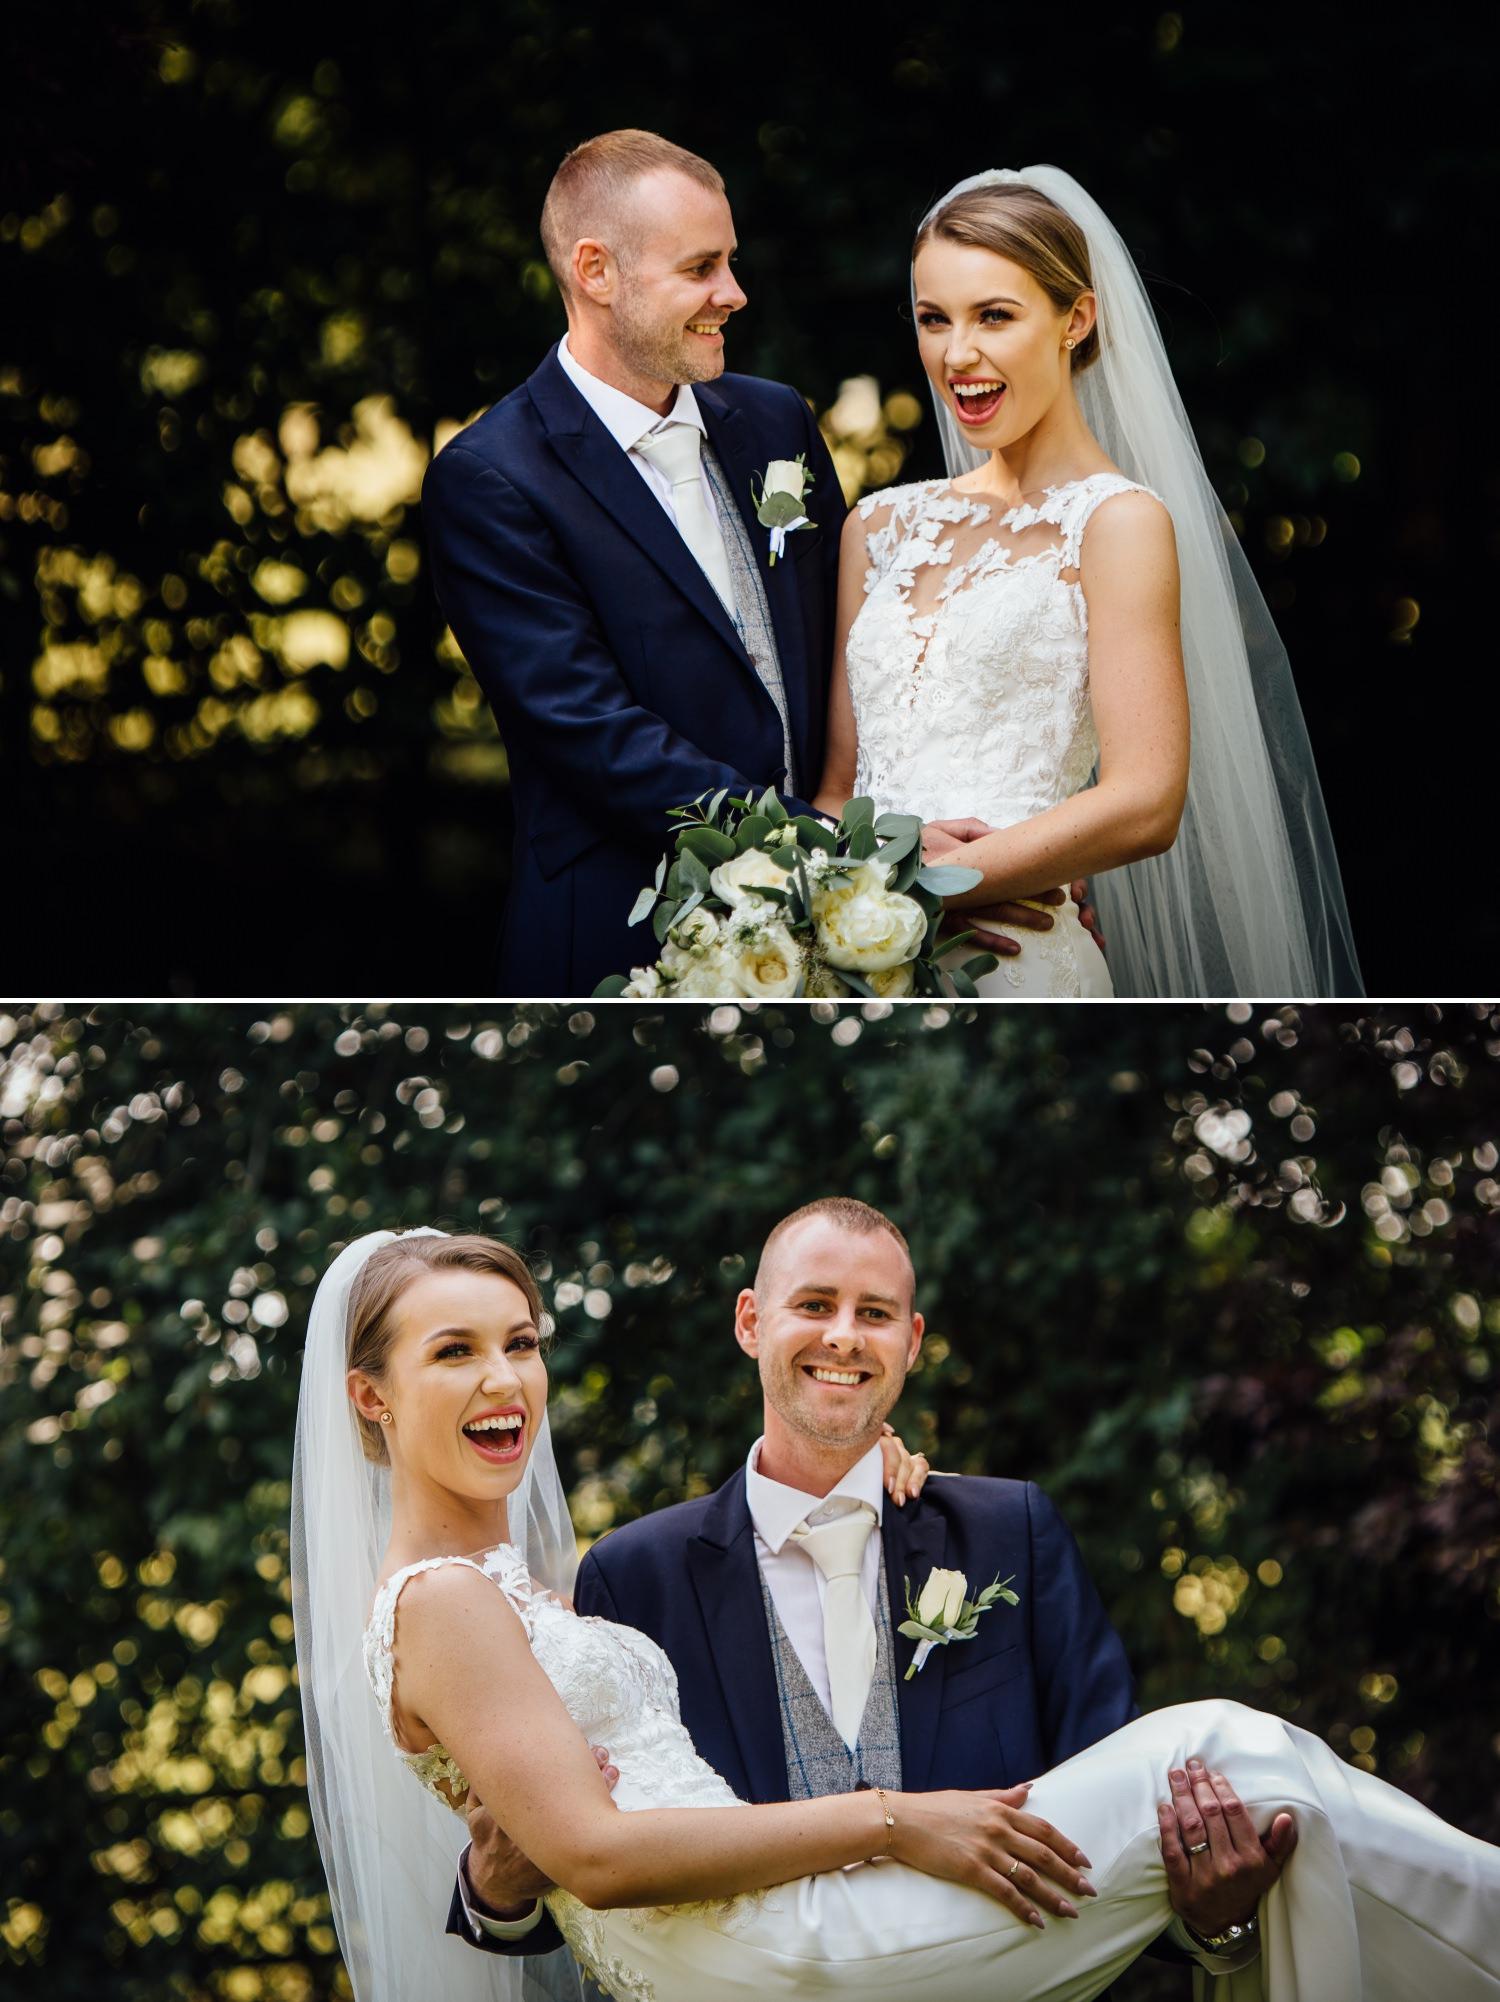 Wedding photography portraits at Milton Hall, Lancashire